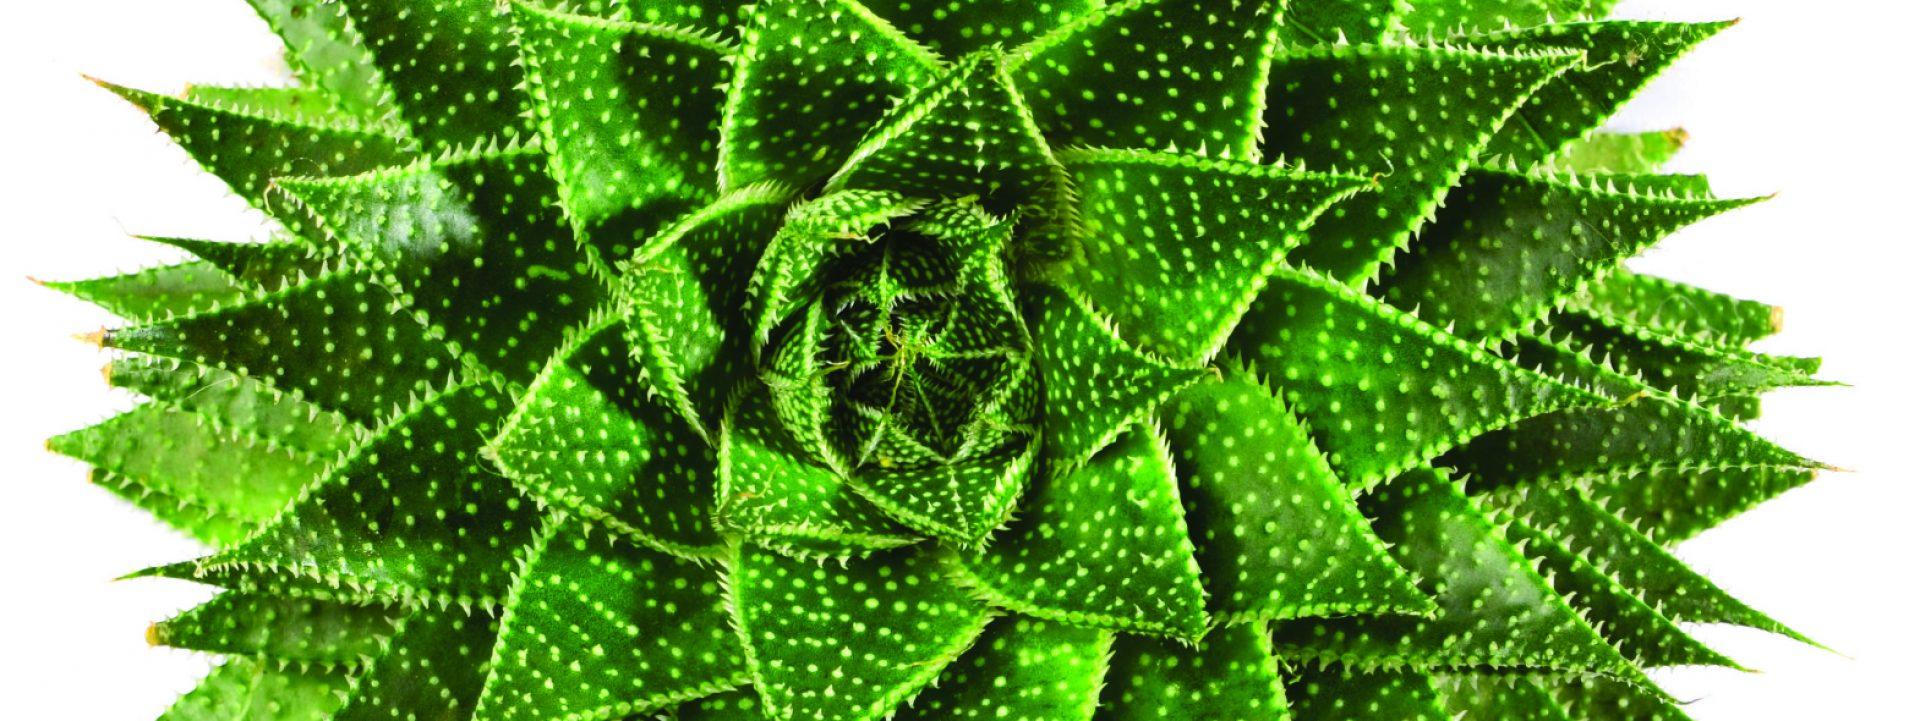 cropped-annie-plant-2.jpg